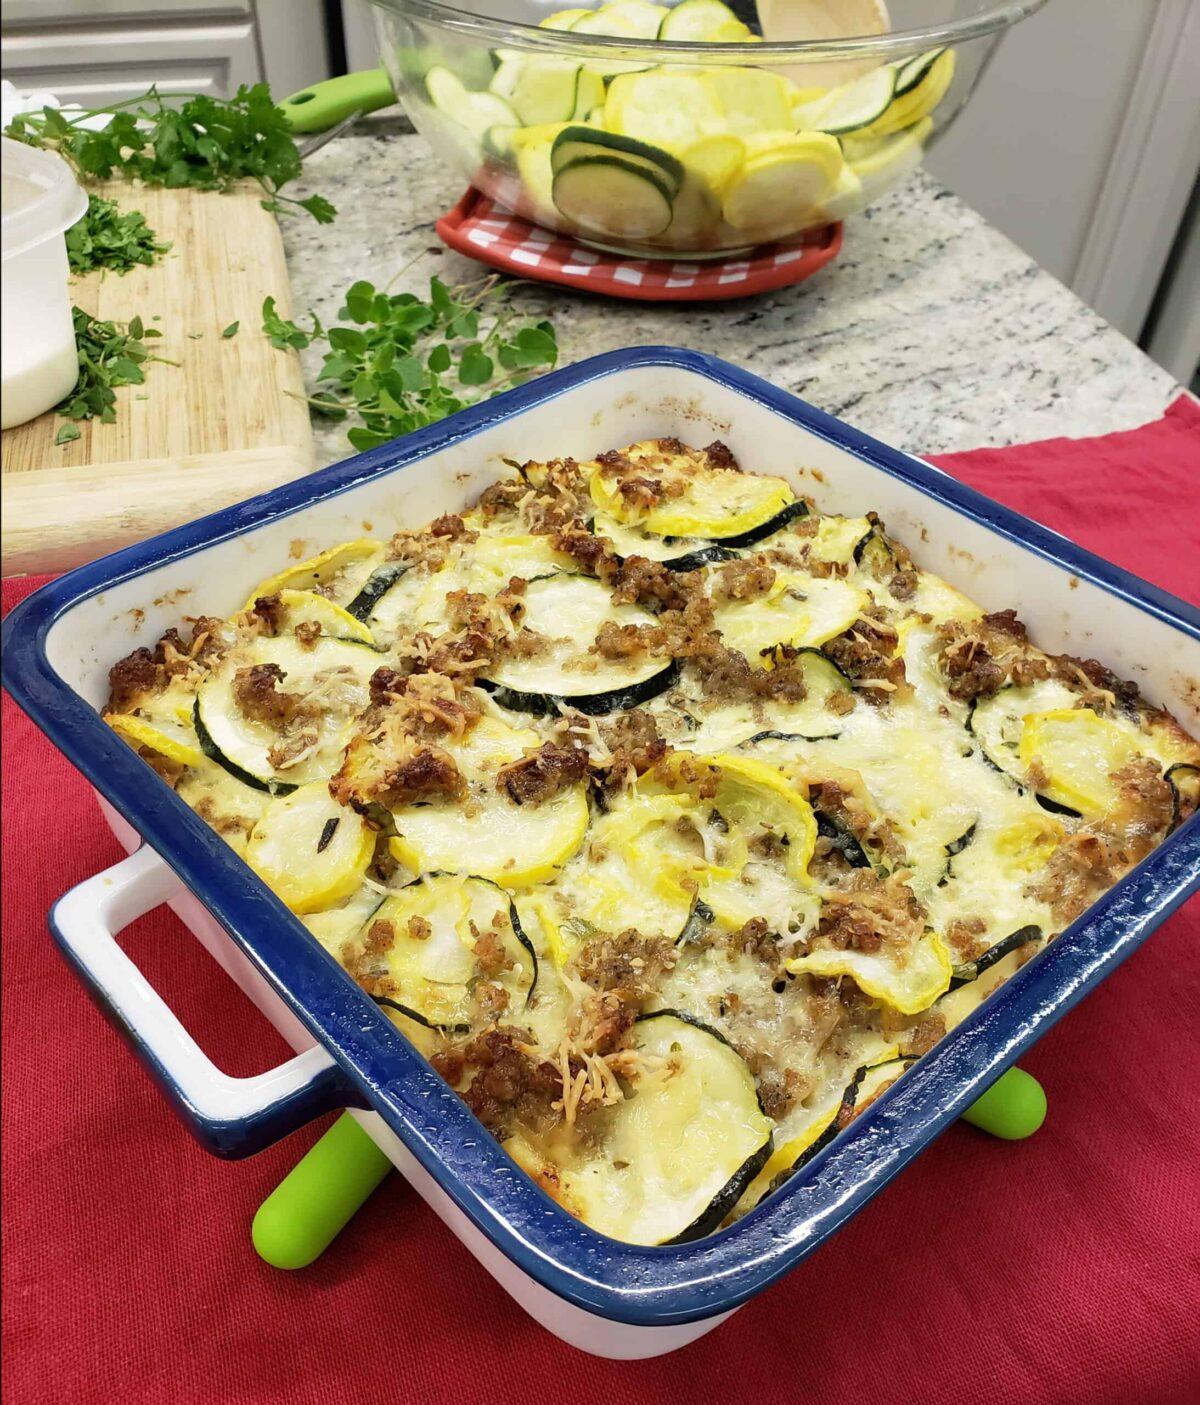 Sausage squash casserole keto on WBRC Fox 6 Good Day Alabama